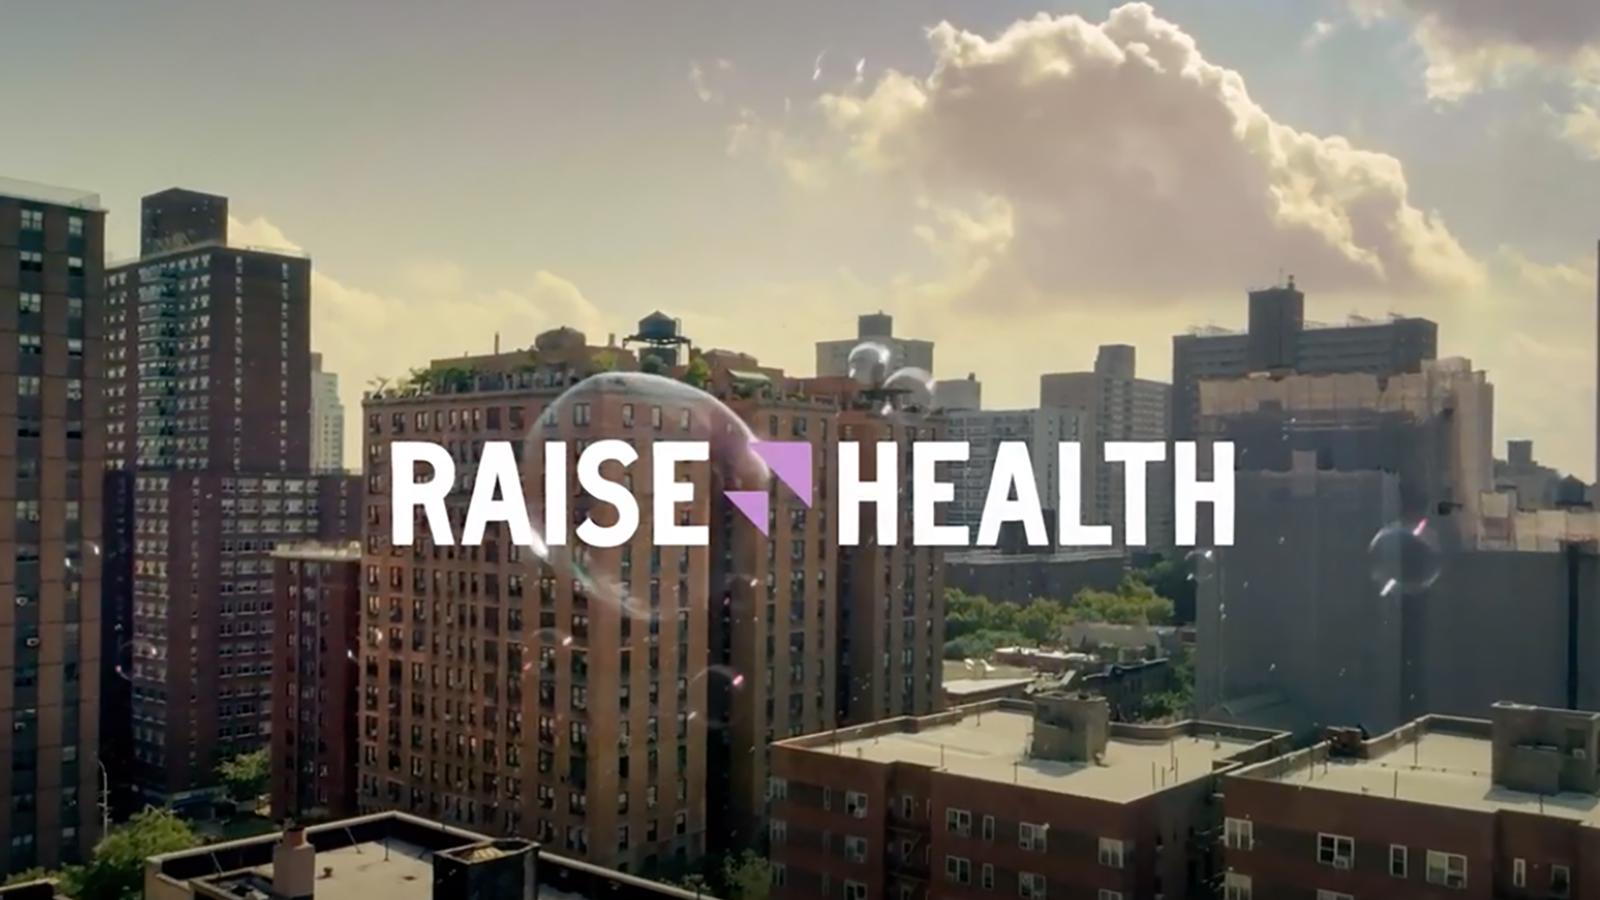 Image: https://a.storyblok.com/f/114448/1600x900/9503df769b/northwell-raise-health-16x9.jpg